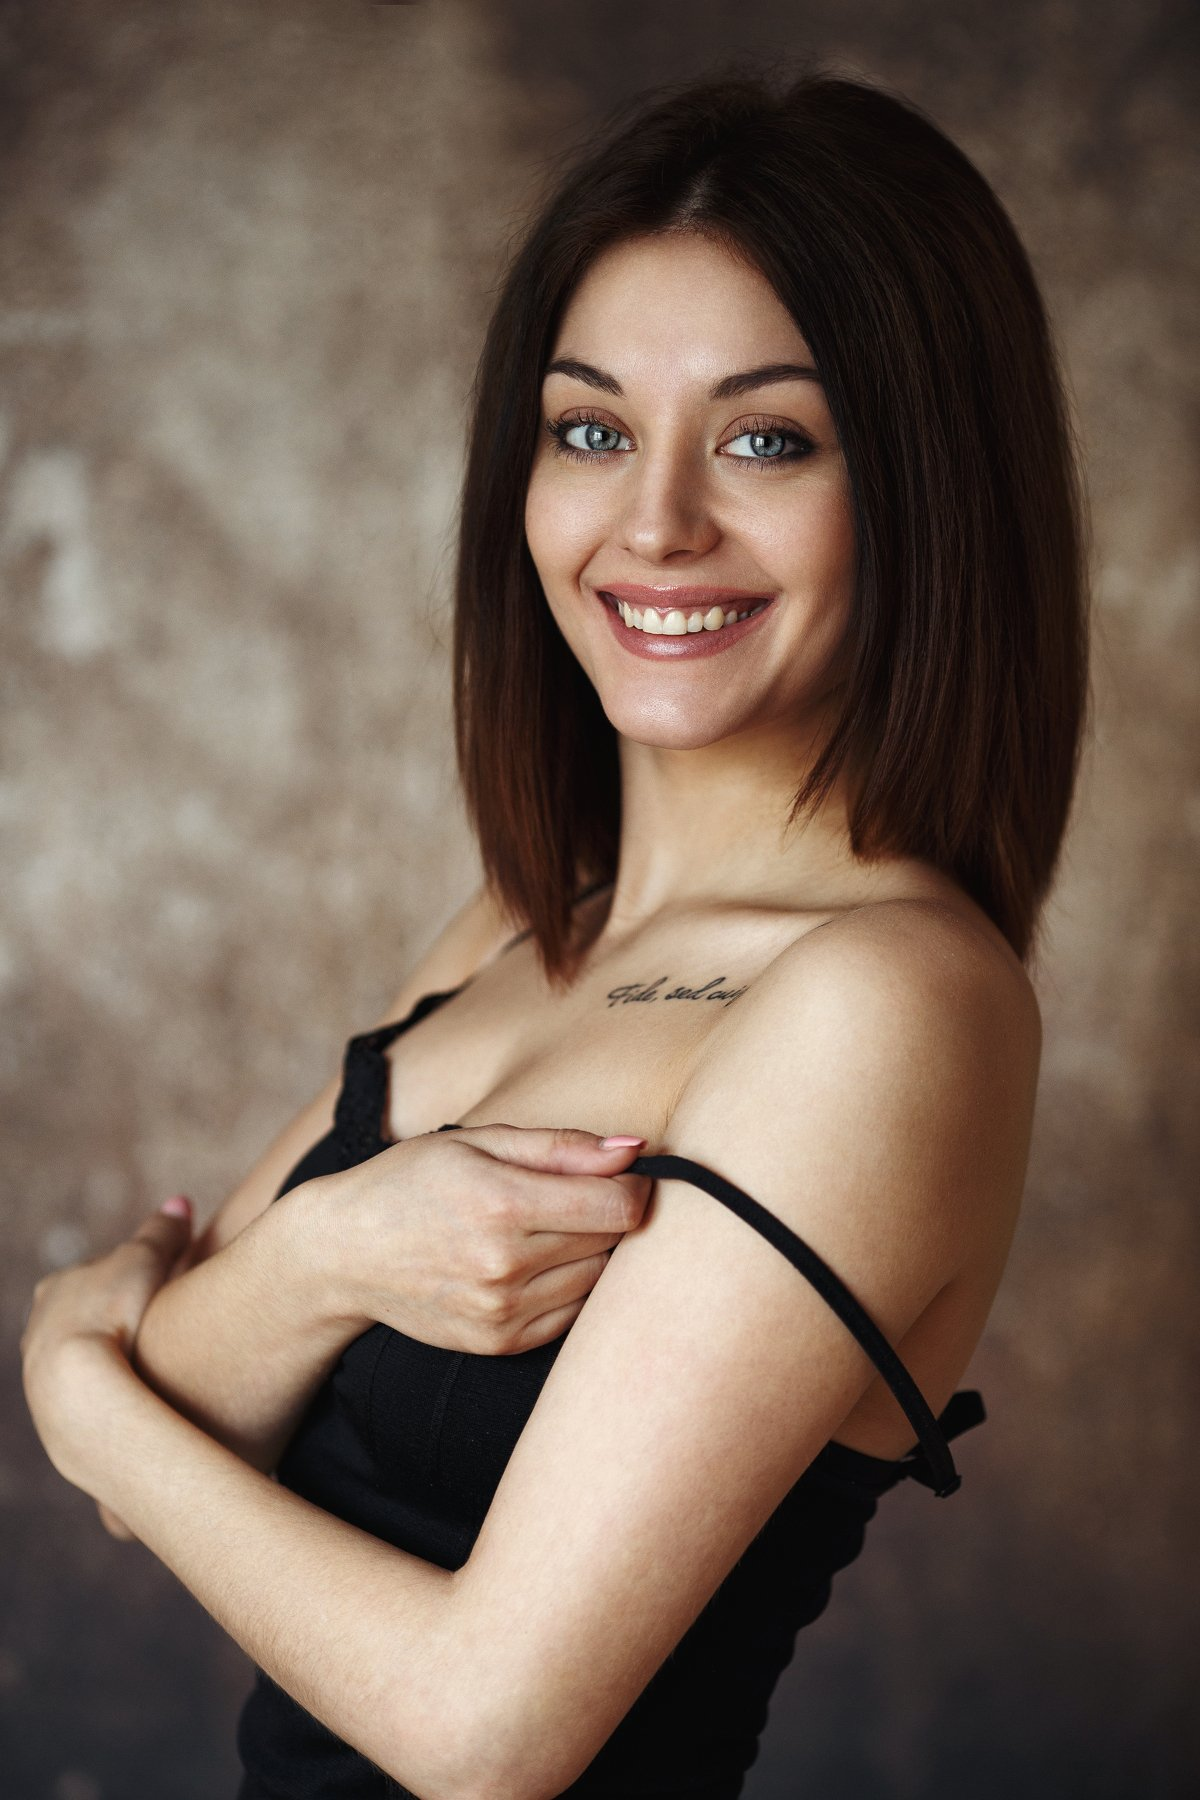 girl, eyes, beautiful, studio, fashion, female, pretty, hair, sexy, young, Астахов Александр